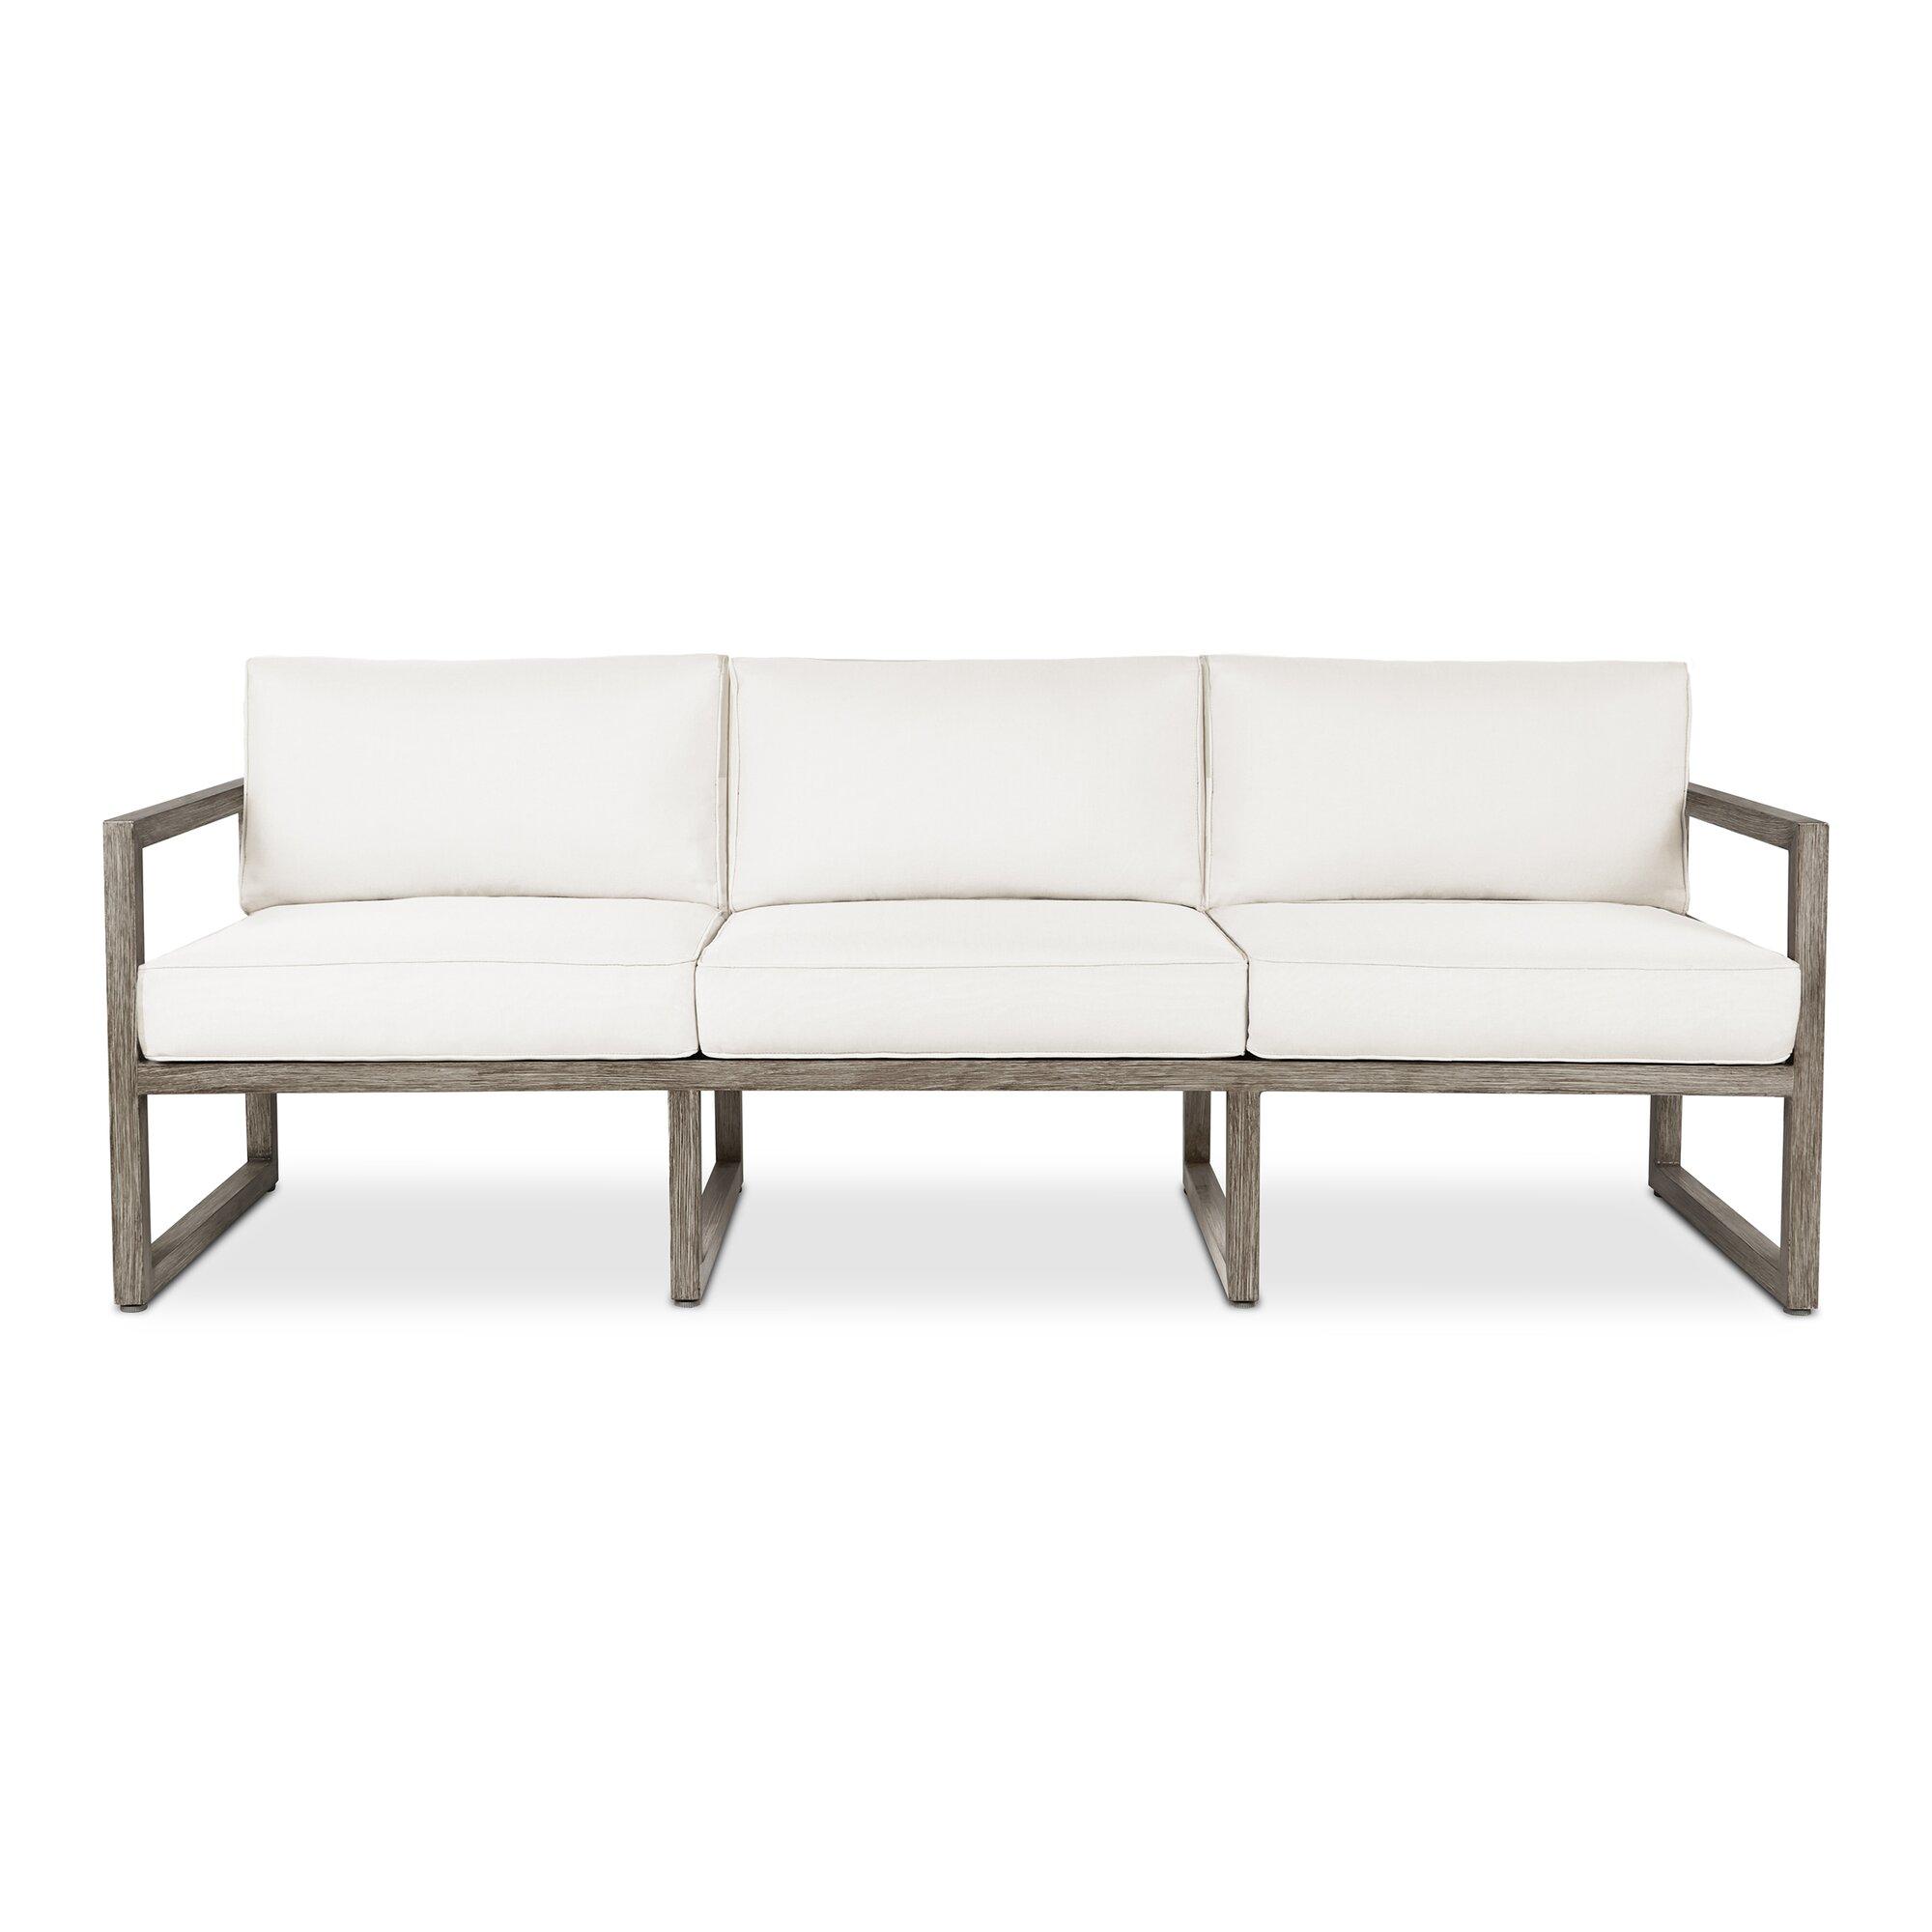 Modern outdoor sofa - Monaco 3 Seat Sofa With Cushion